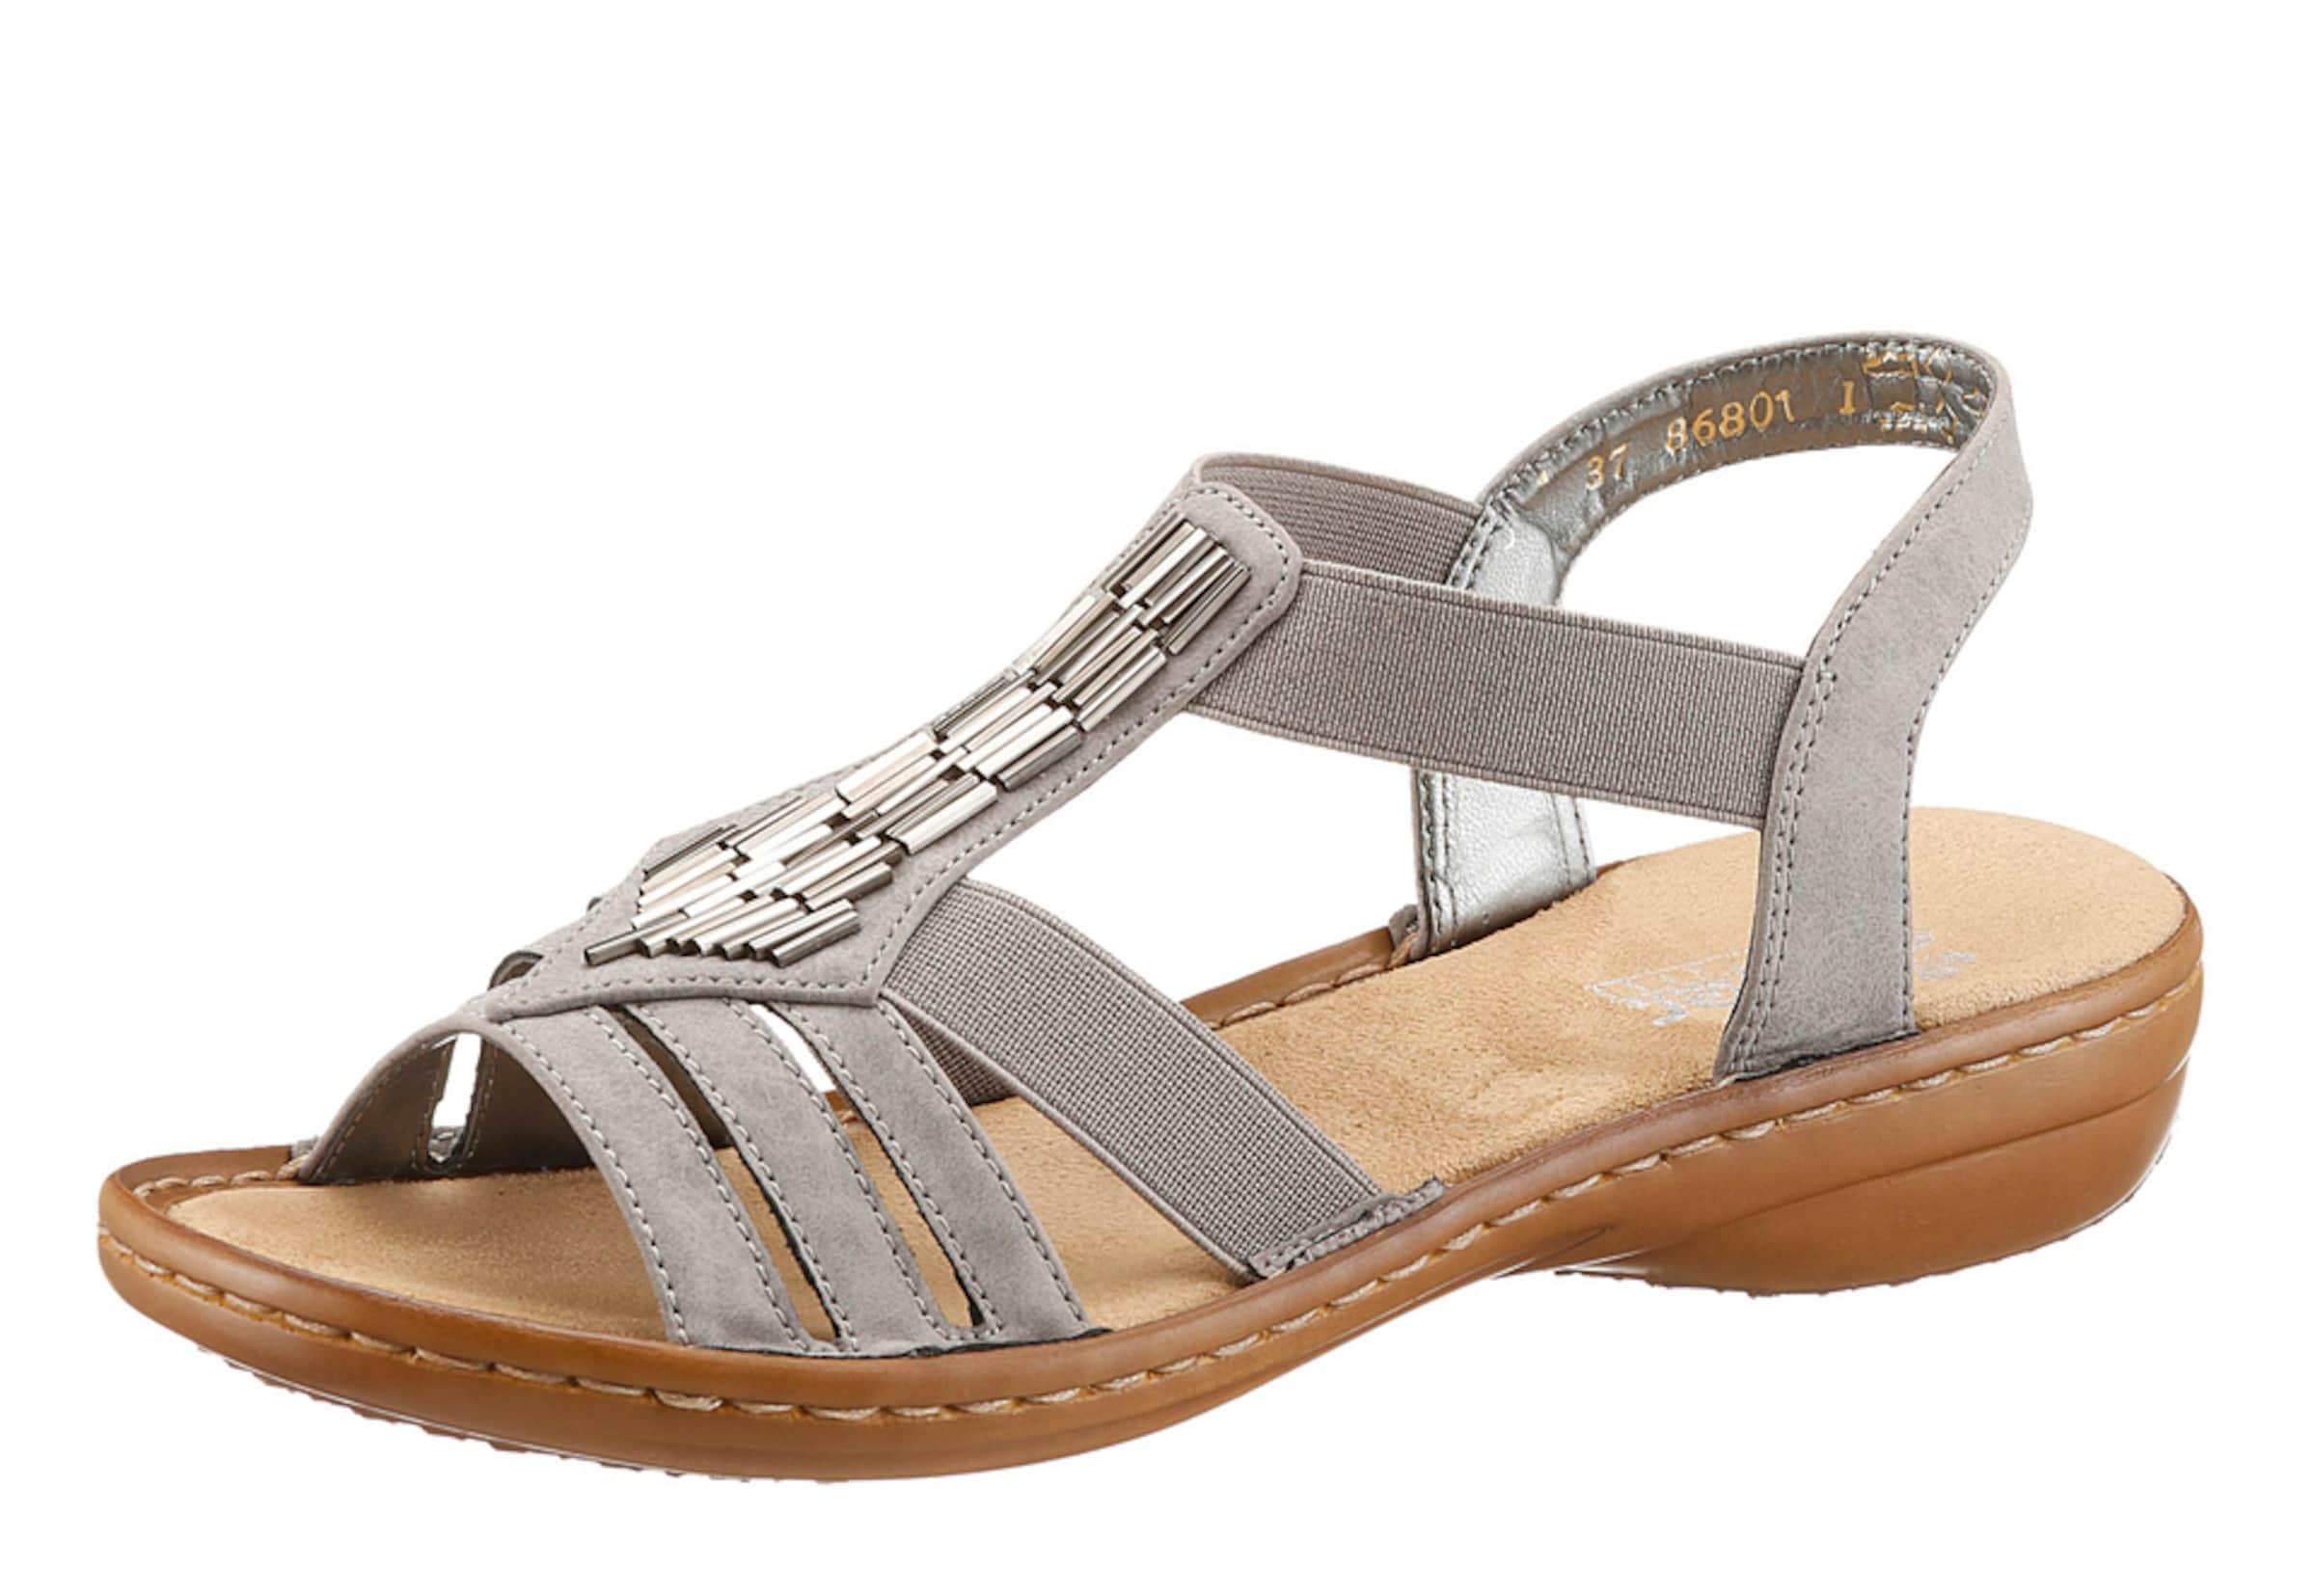 RIEKER Sandale Günstige und langlebige Schuhe